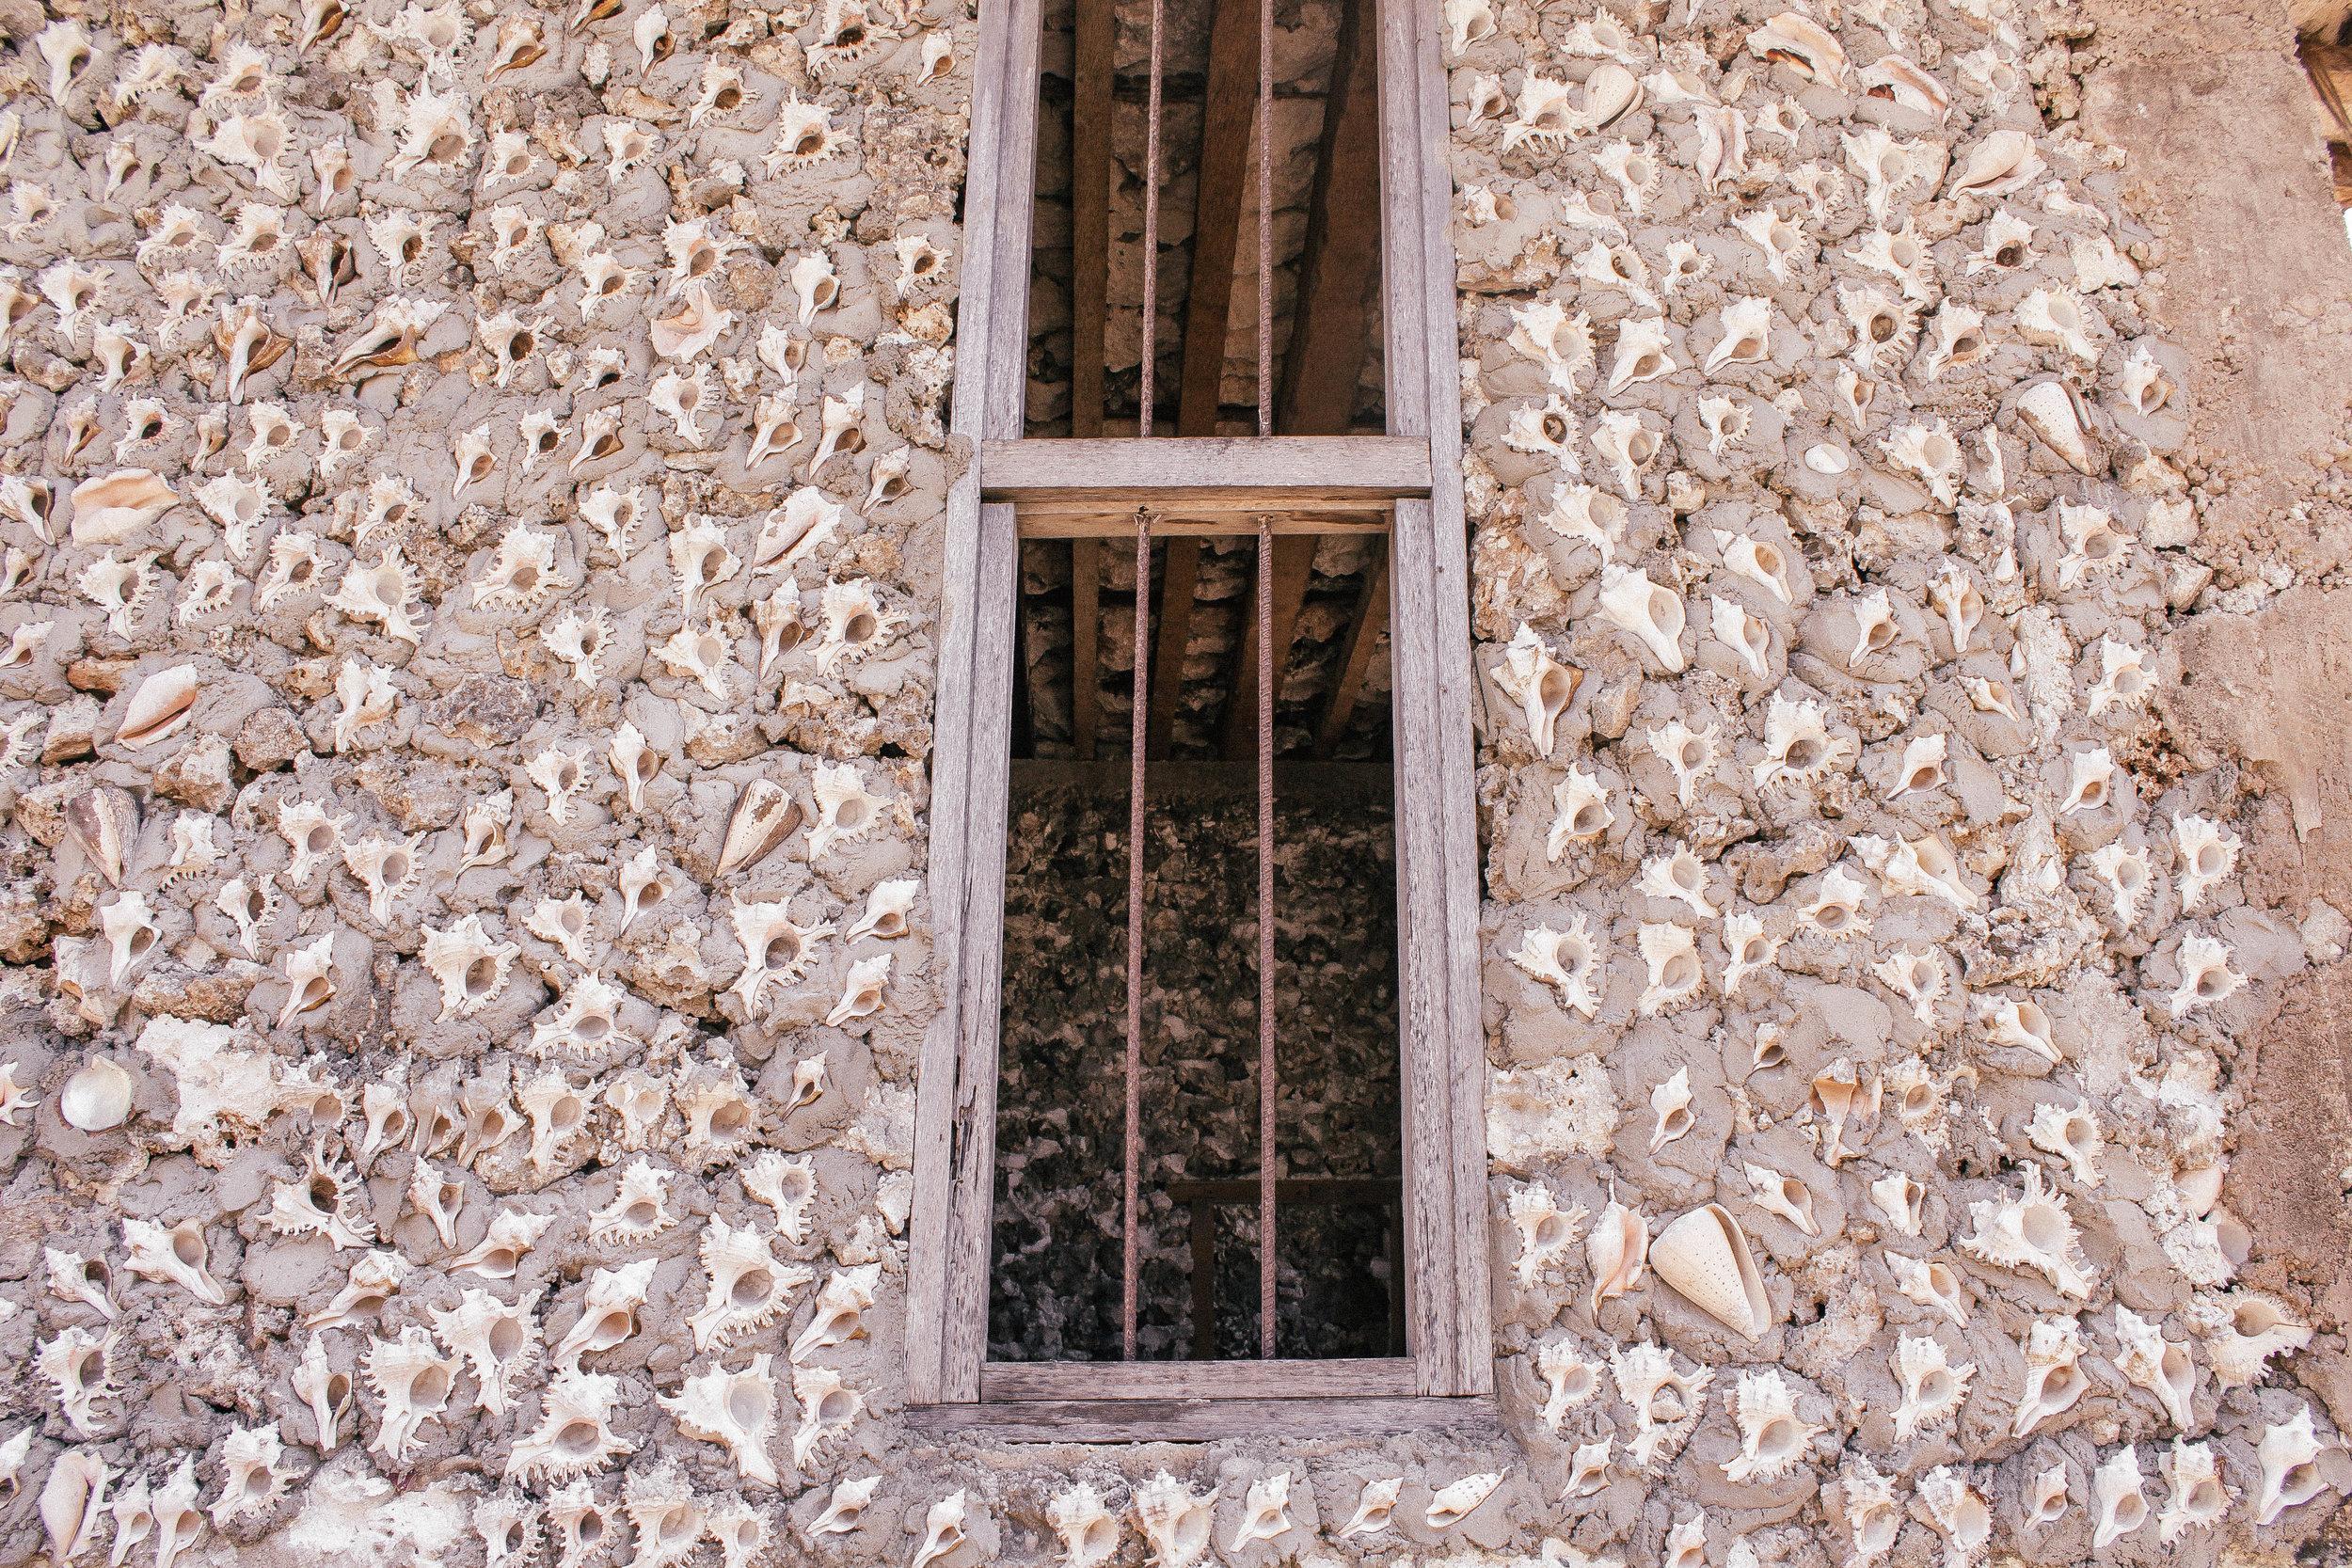 Home made of seashells